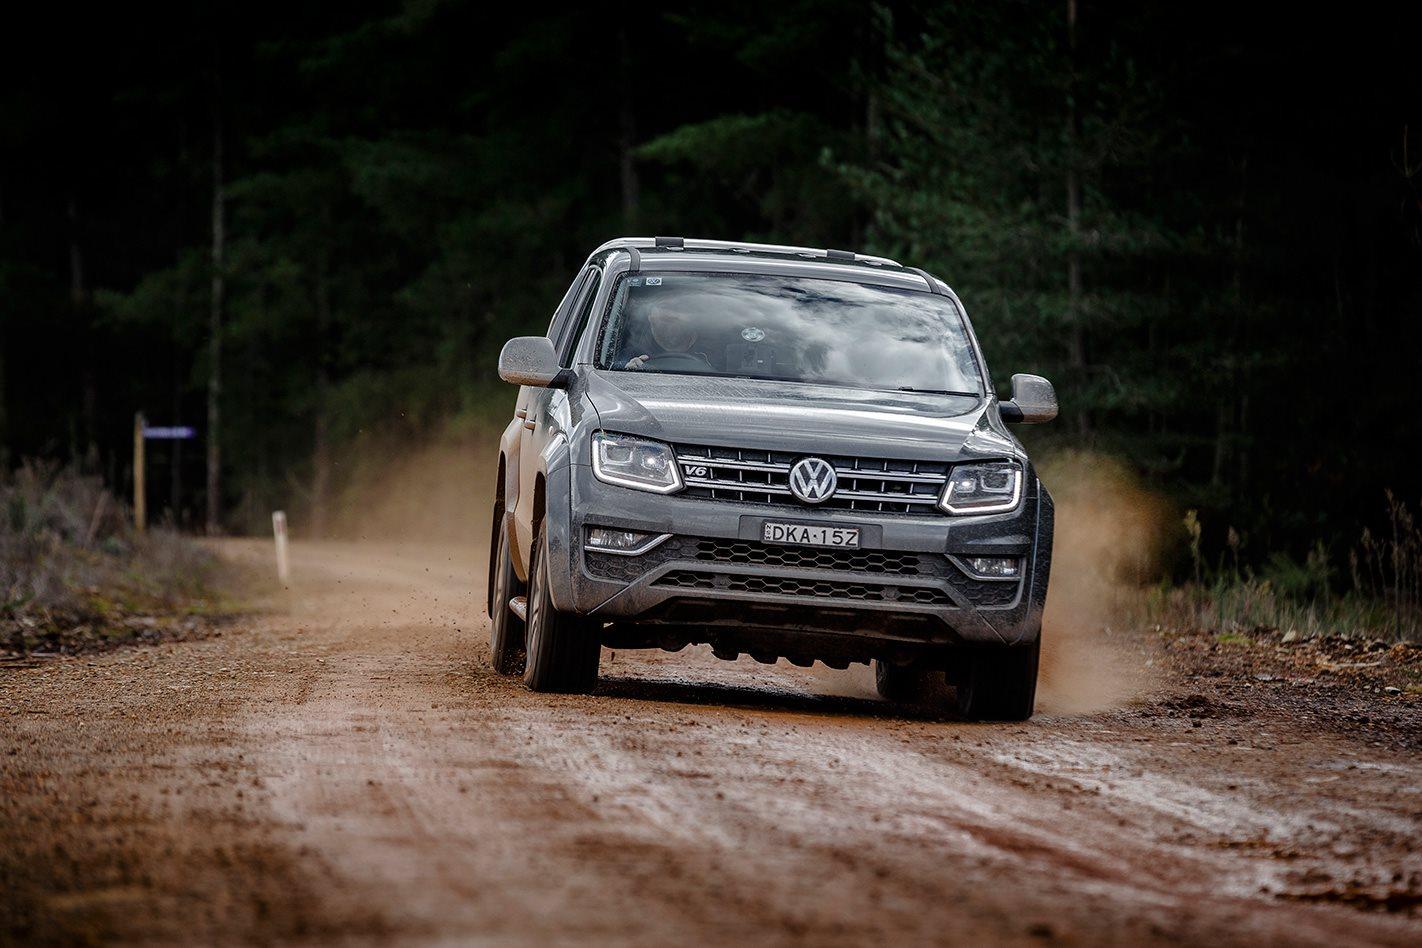 Volkswagen Amarok V6 front.jpg